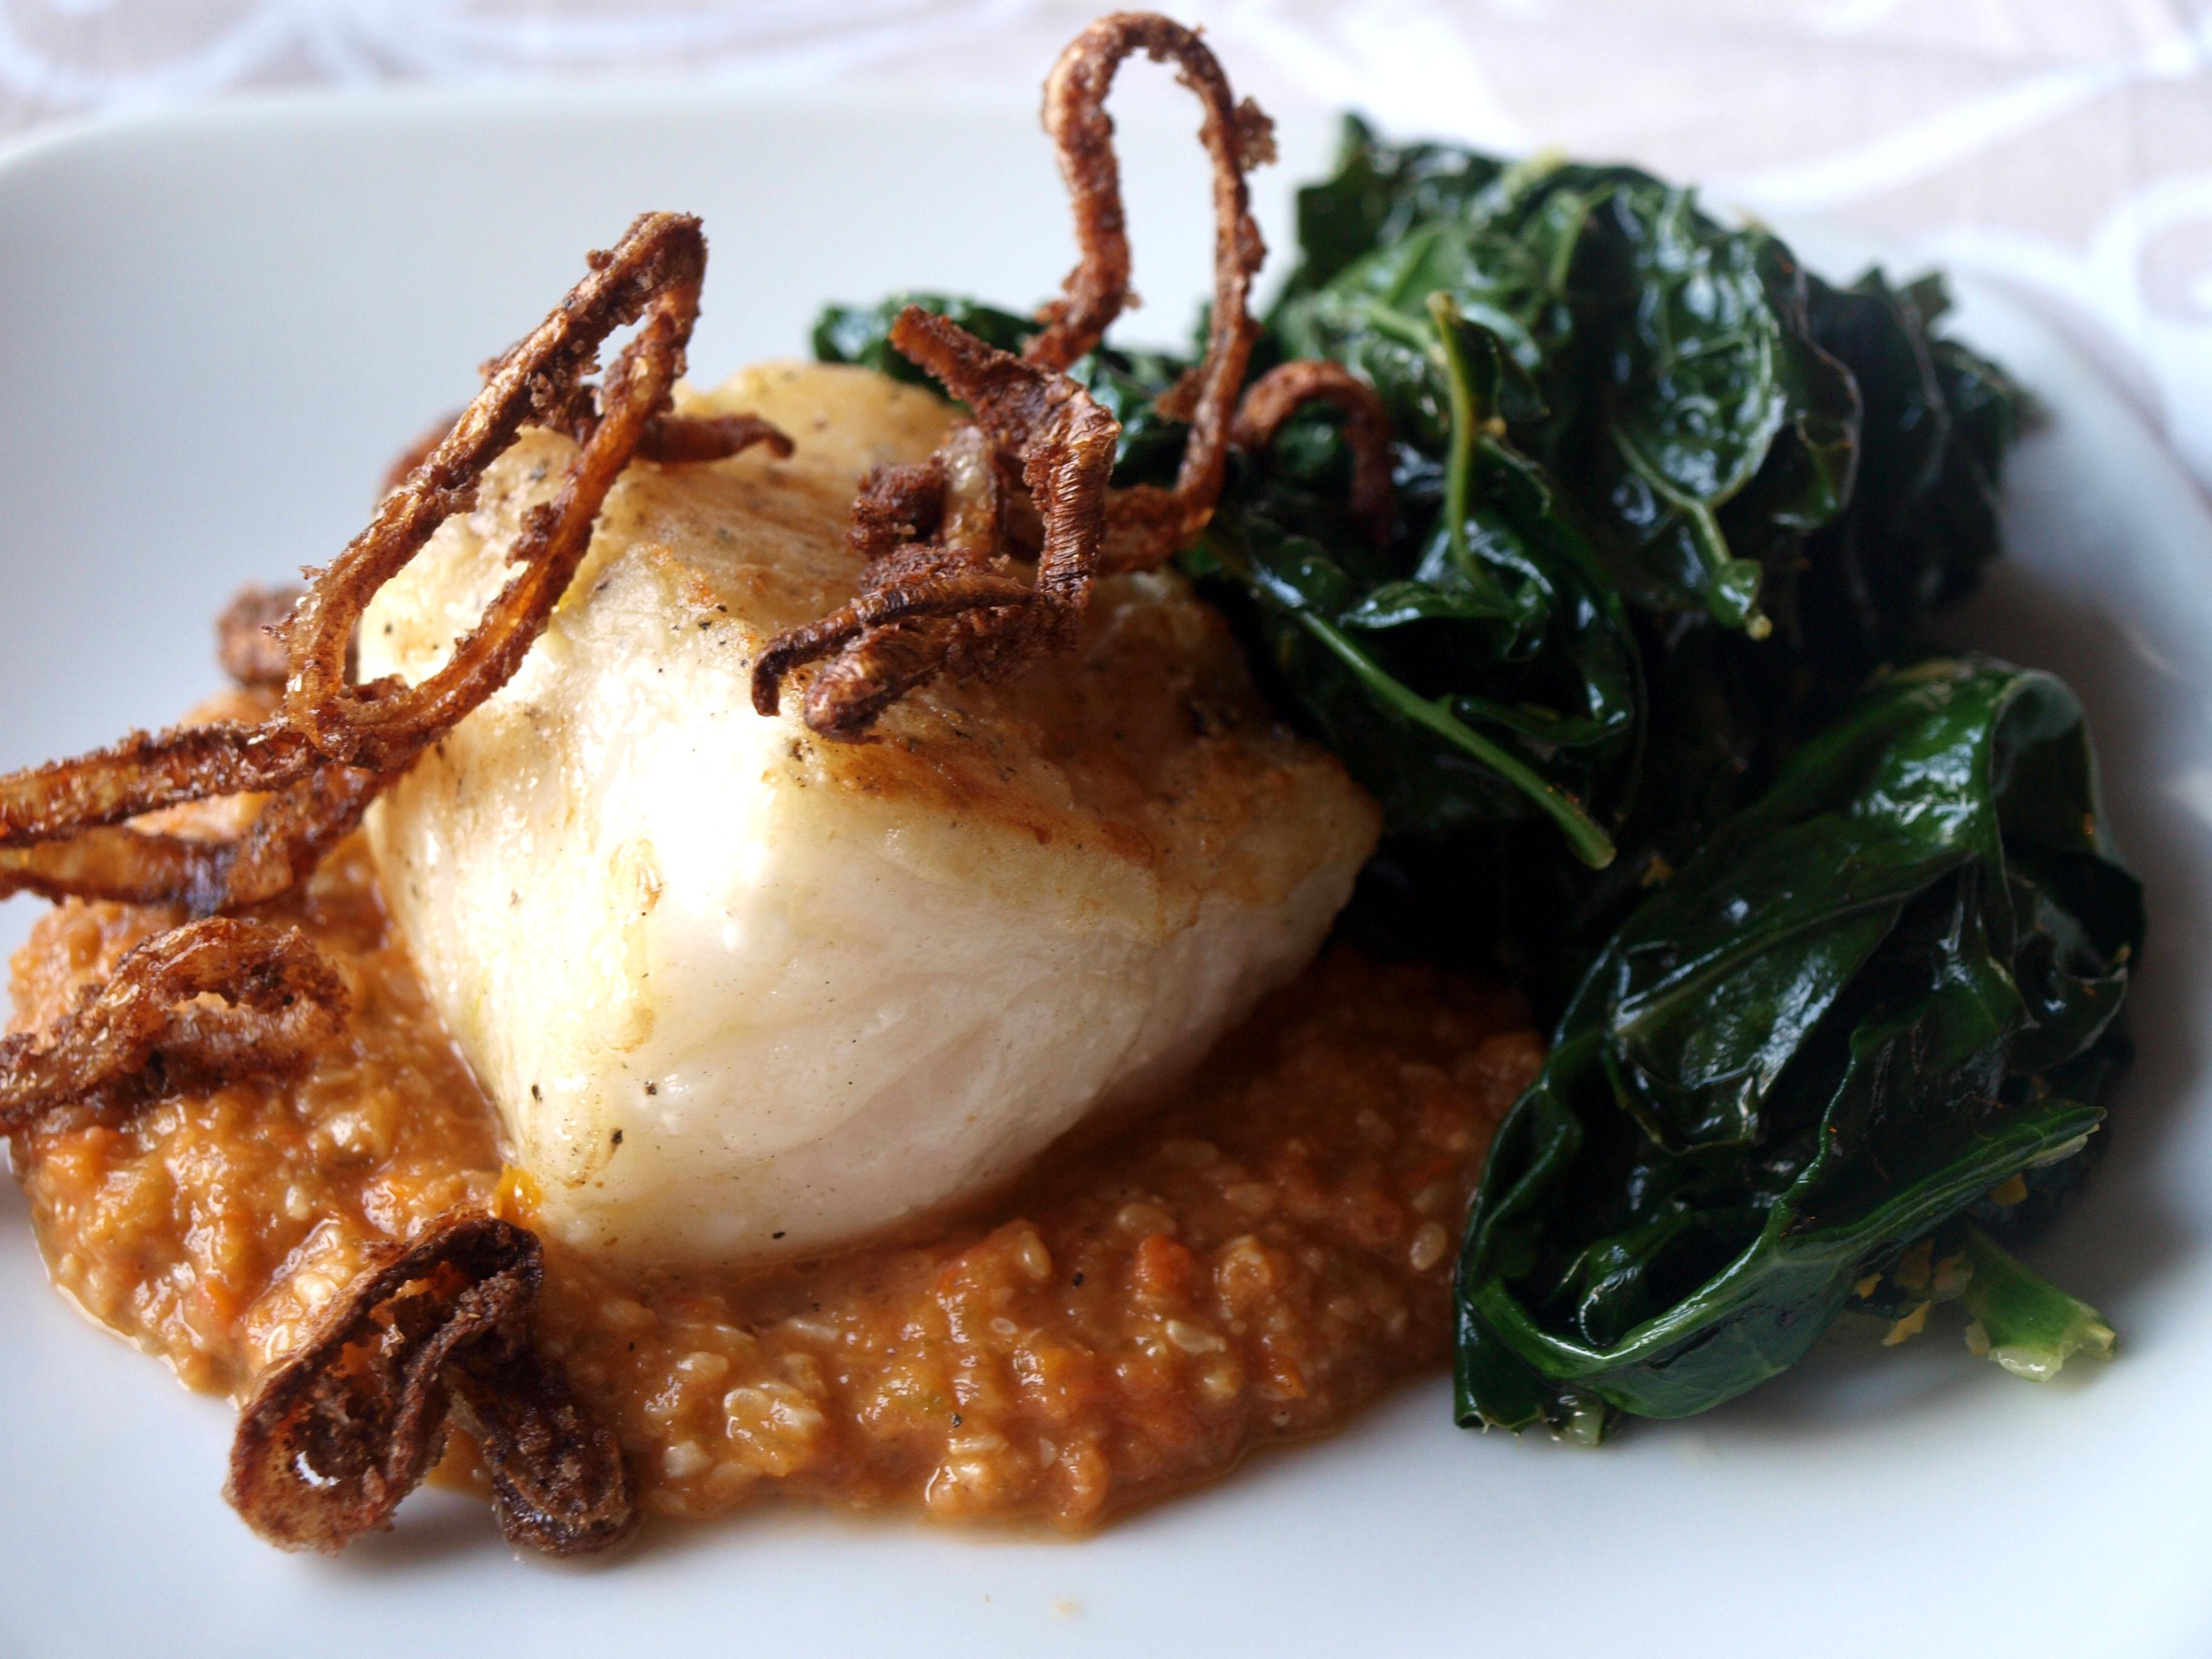 Cod with sesame seed bagna cauda and lacinato kale u callan loves